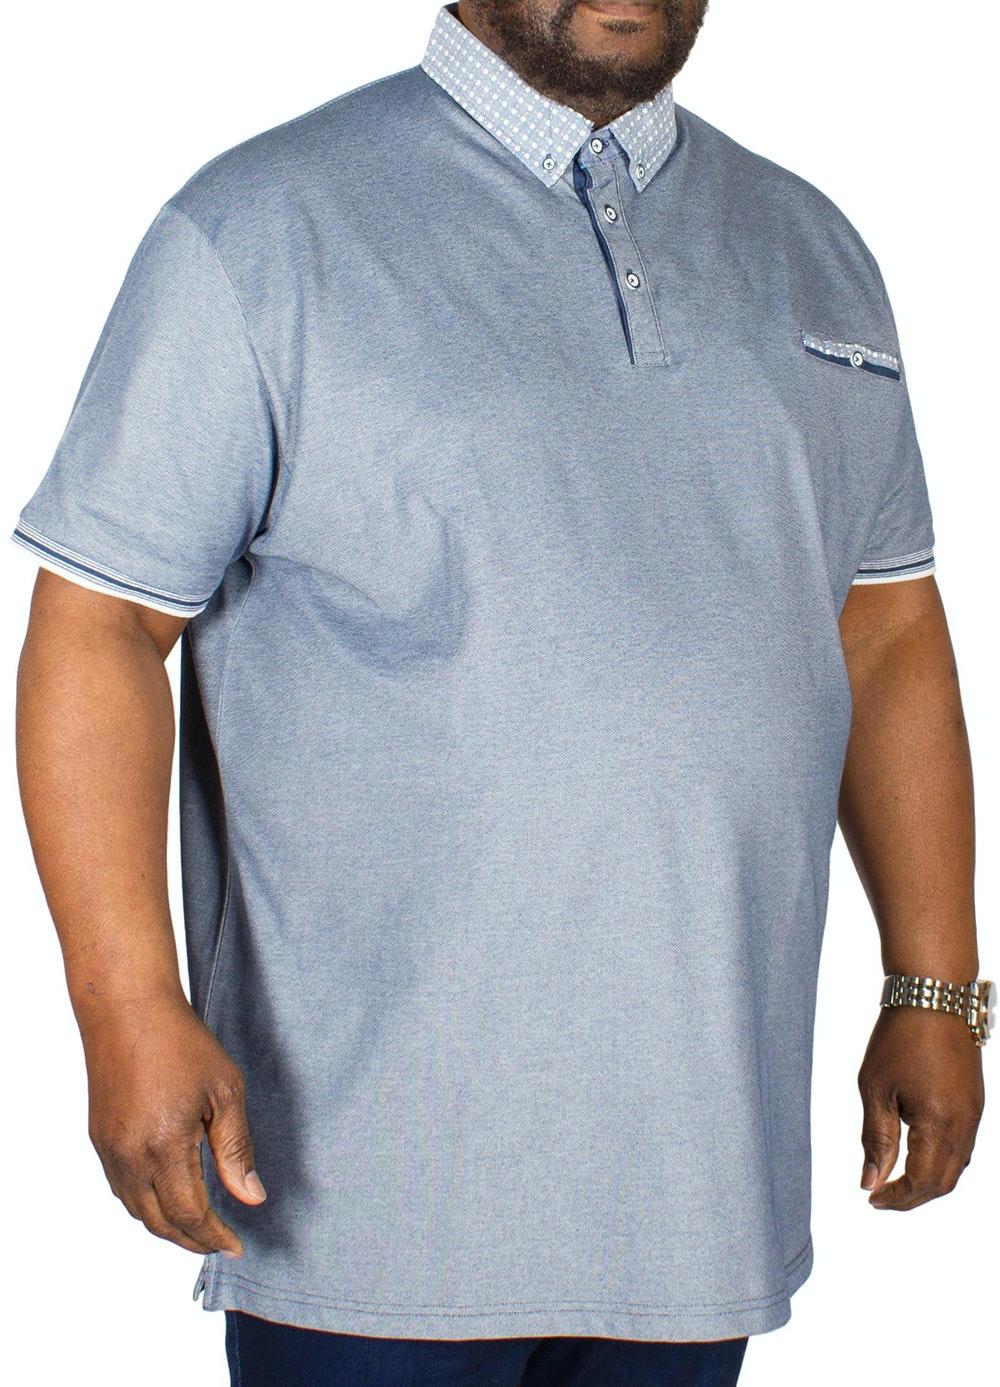 D555 Journey Fine Melange Pique Polo Shirt Navy